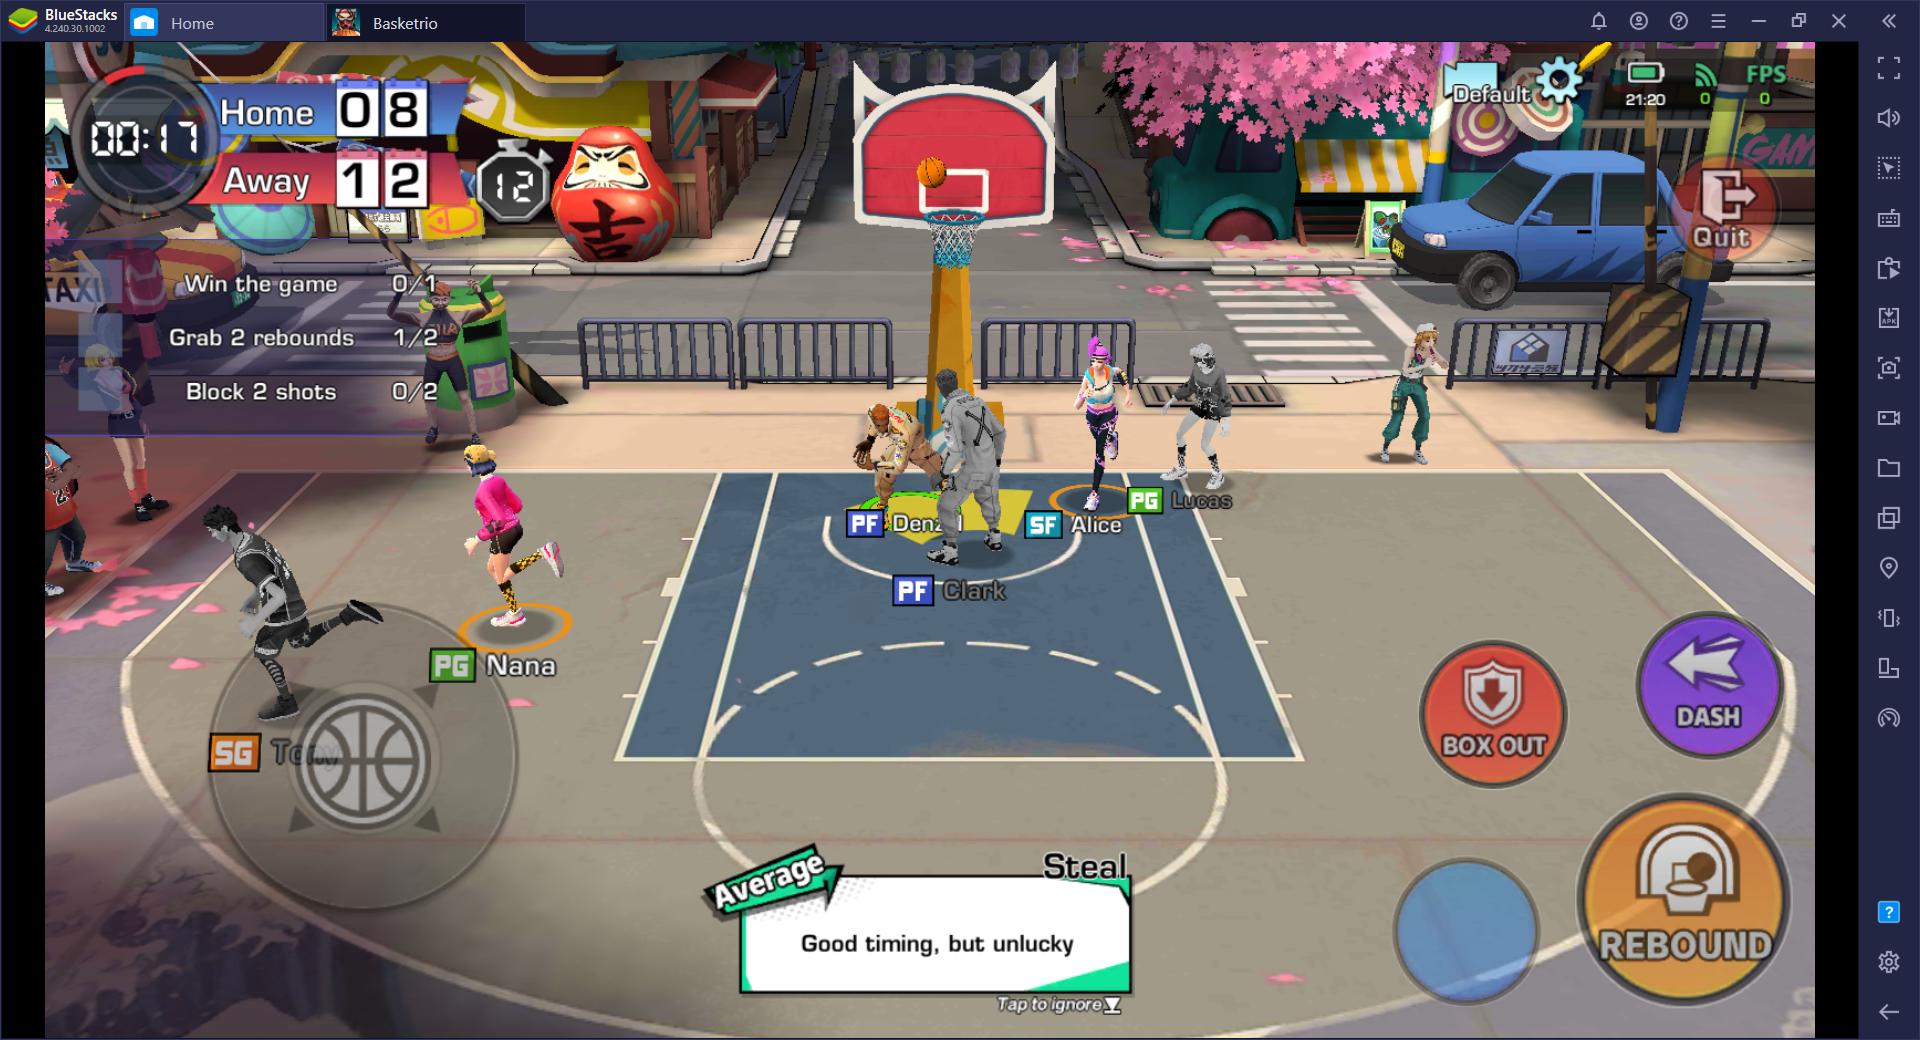 Basketrio di PC – Tips dan Trik Untuk Newbie Dalam Bermain Menggunakan BlueStacks di PC dan Mac